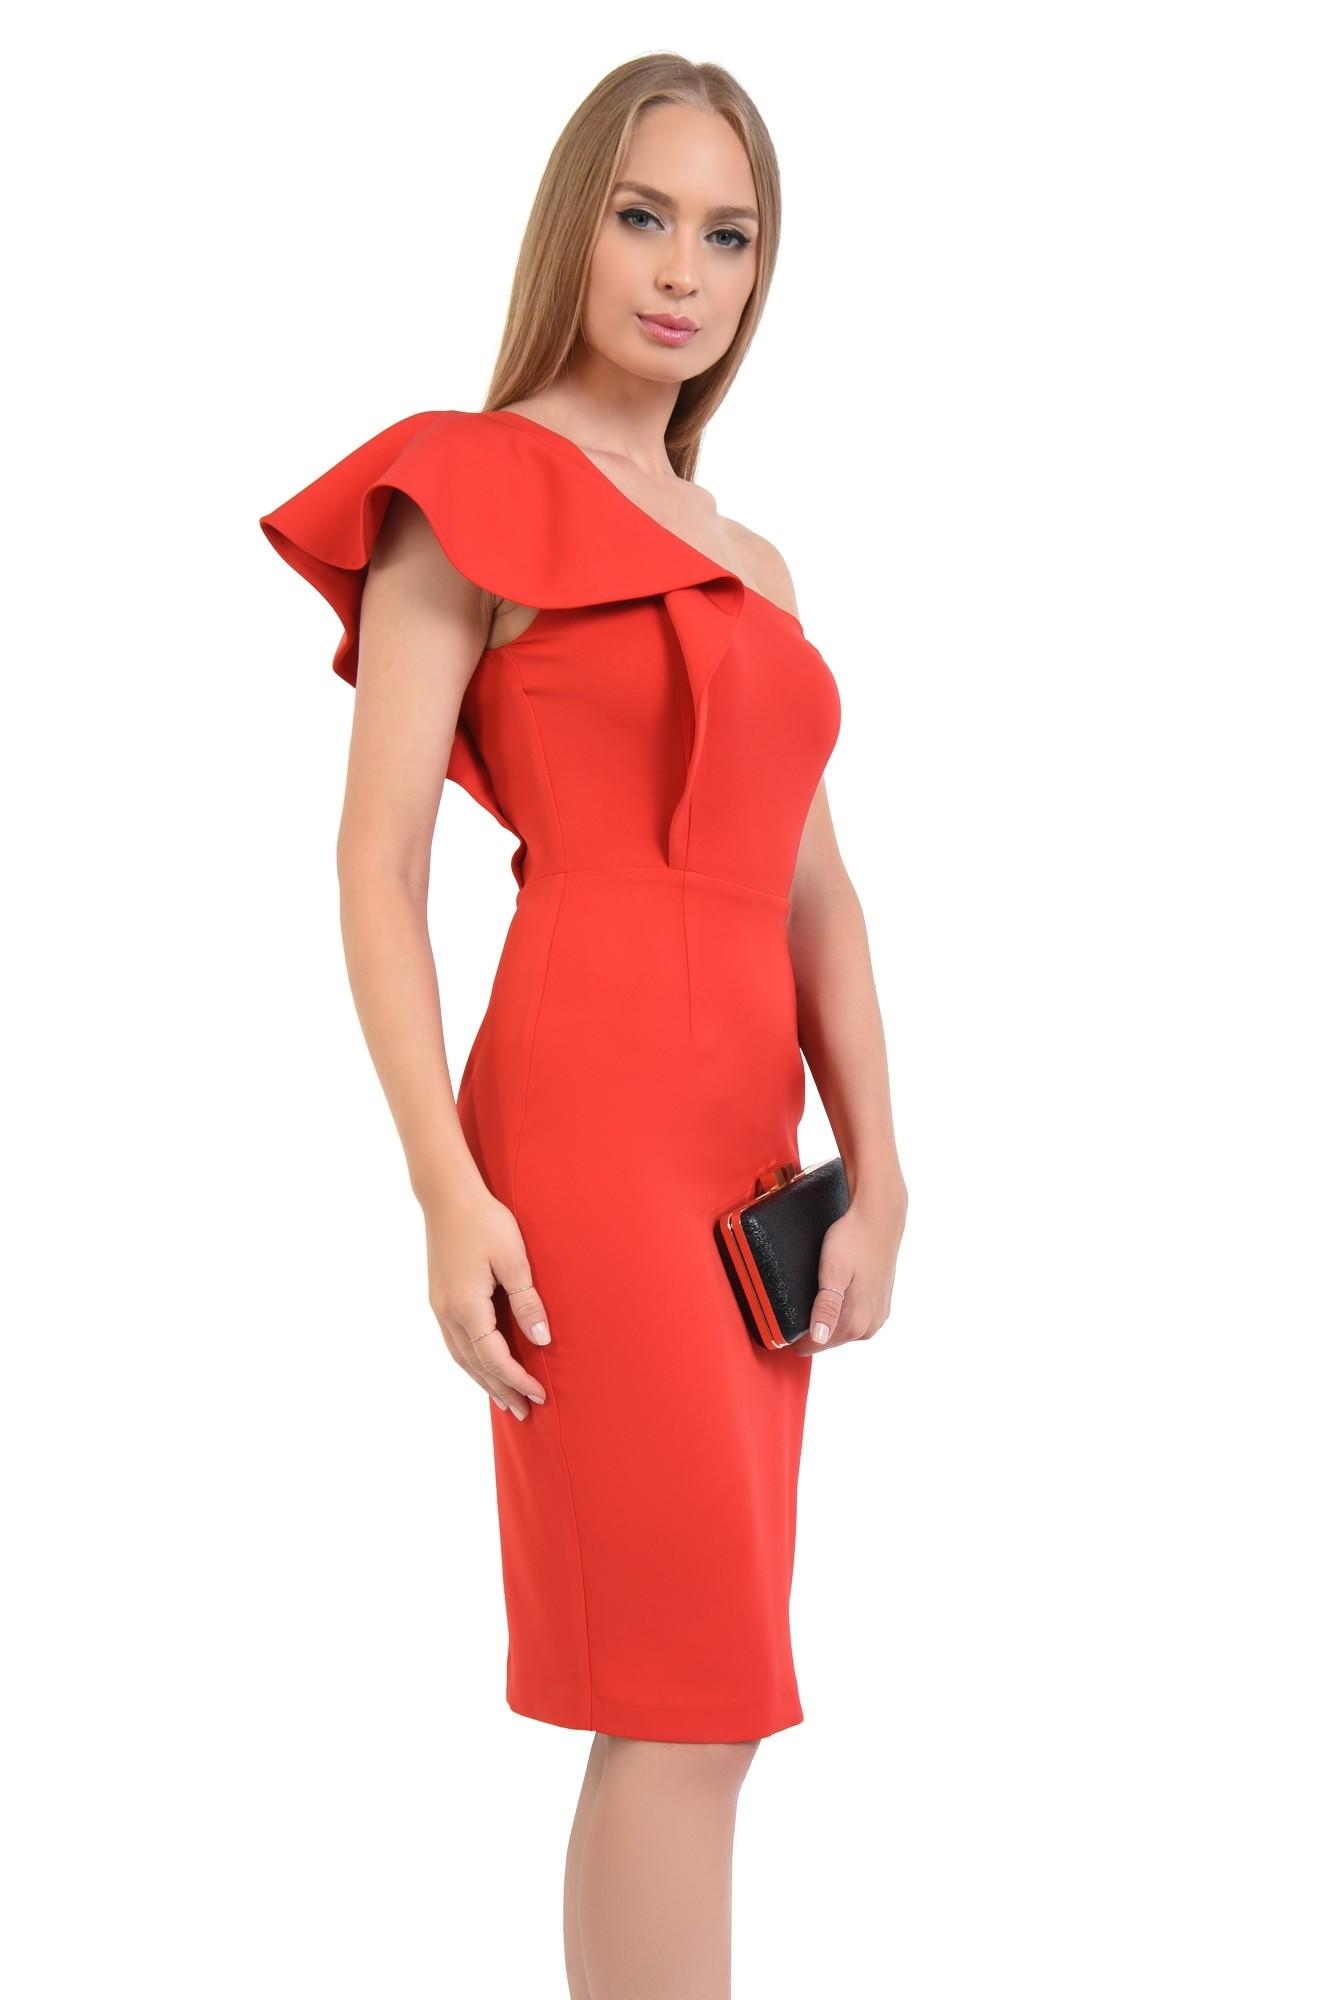 0 - rochie de ocazie, cambrata, slit la spate, rochii online